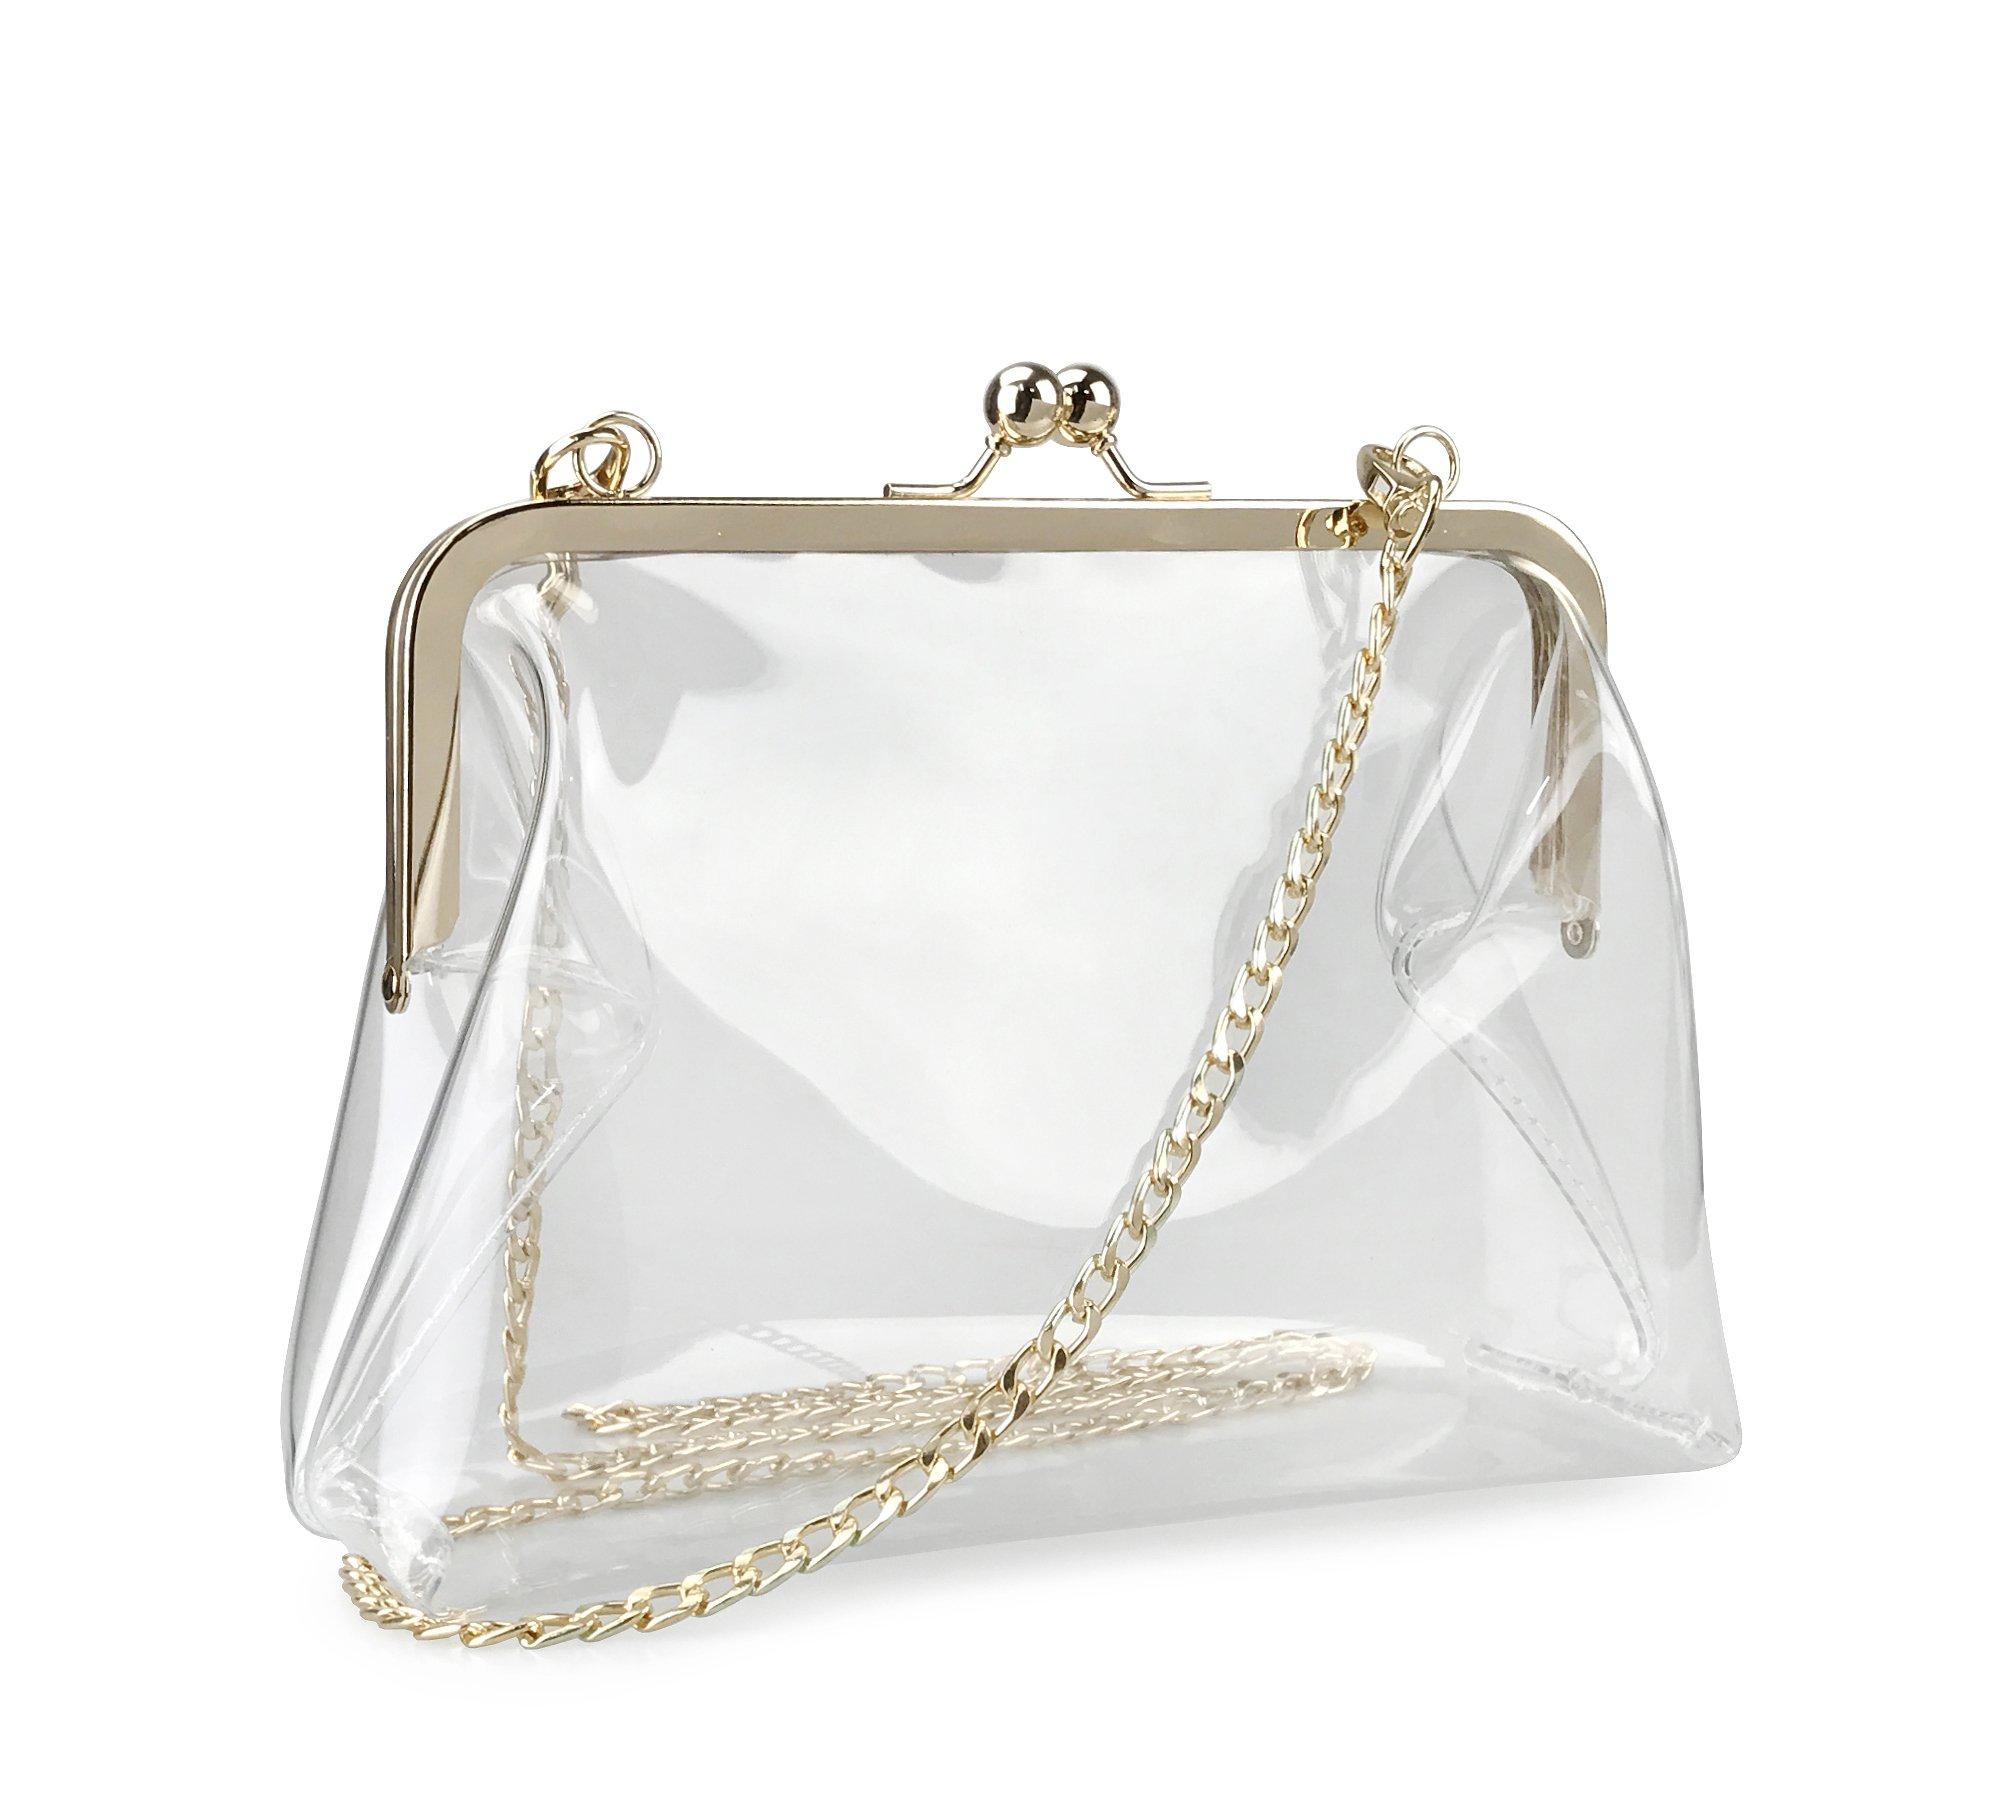 Hoxis Clear Transparent PVC Kiss Lock Chain Cross Body Bag Womens Clutch (Clear)